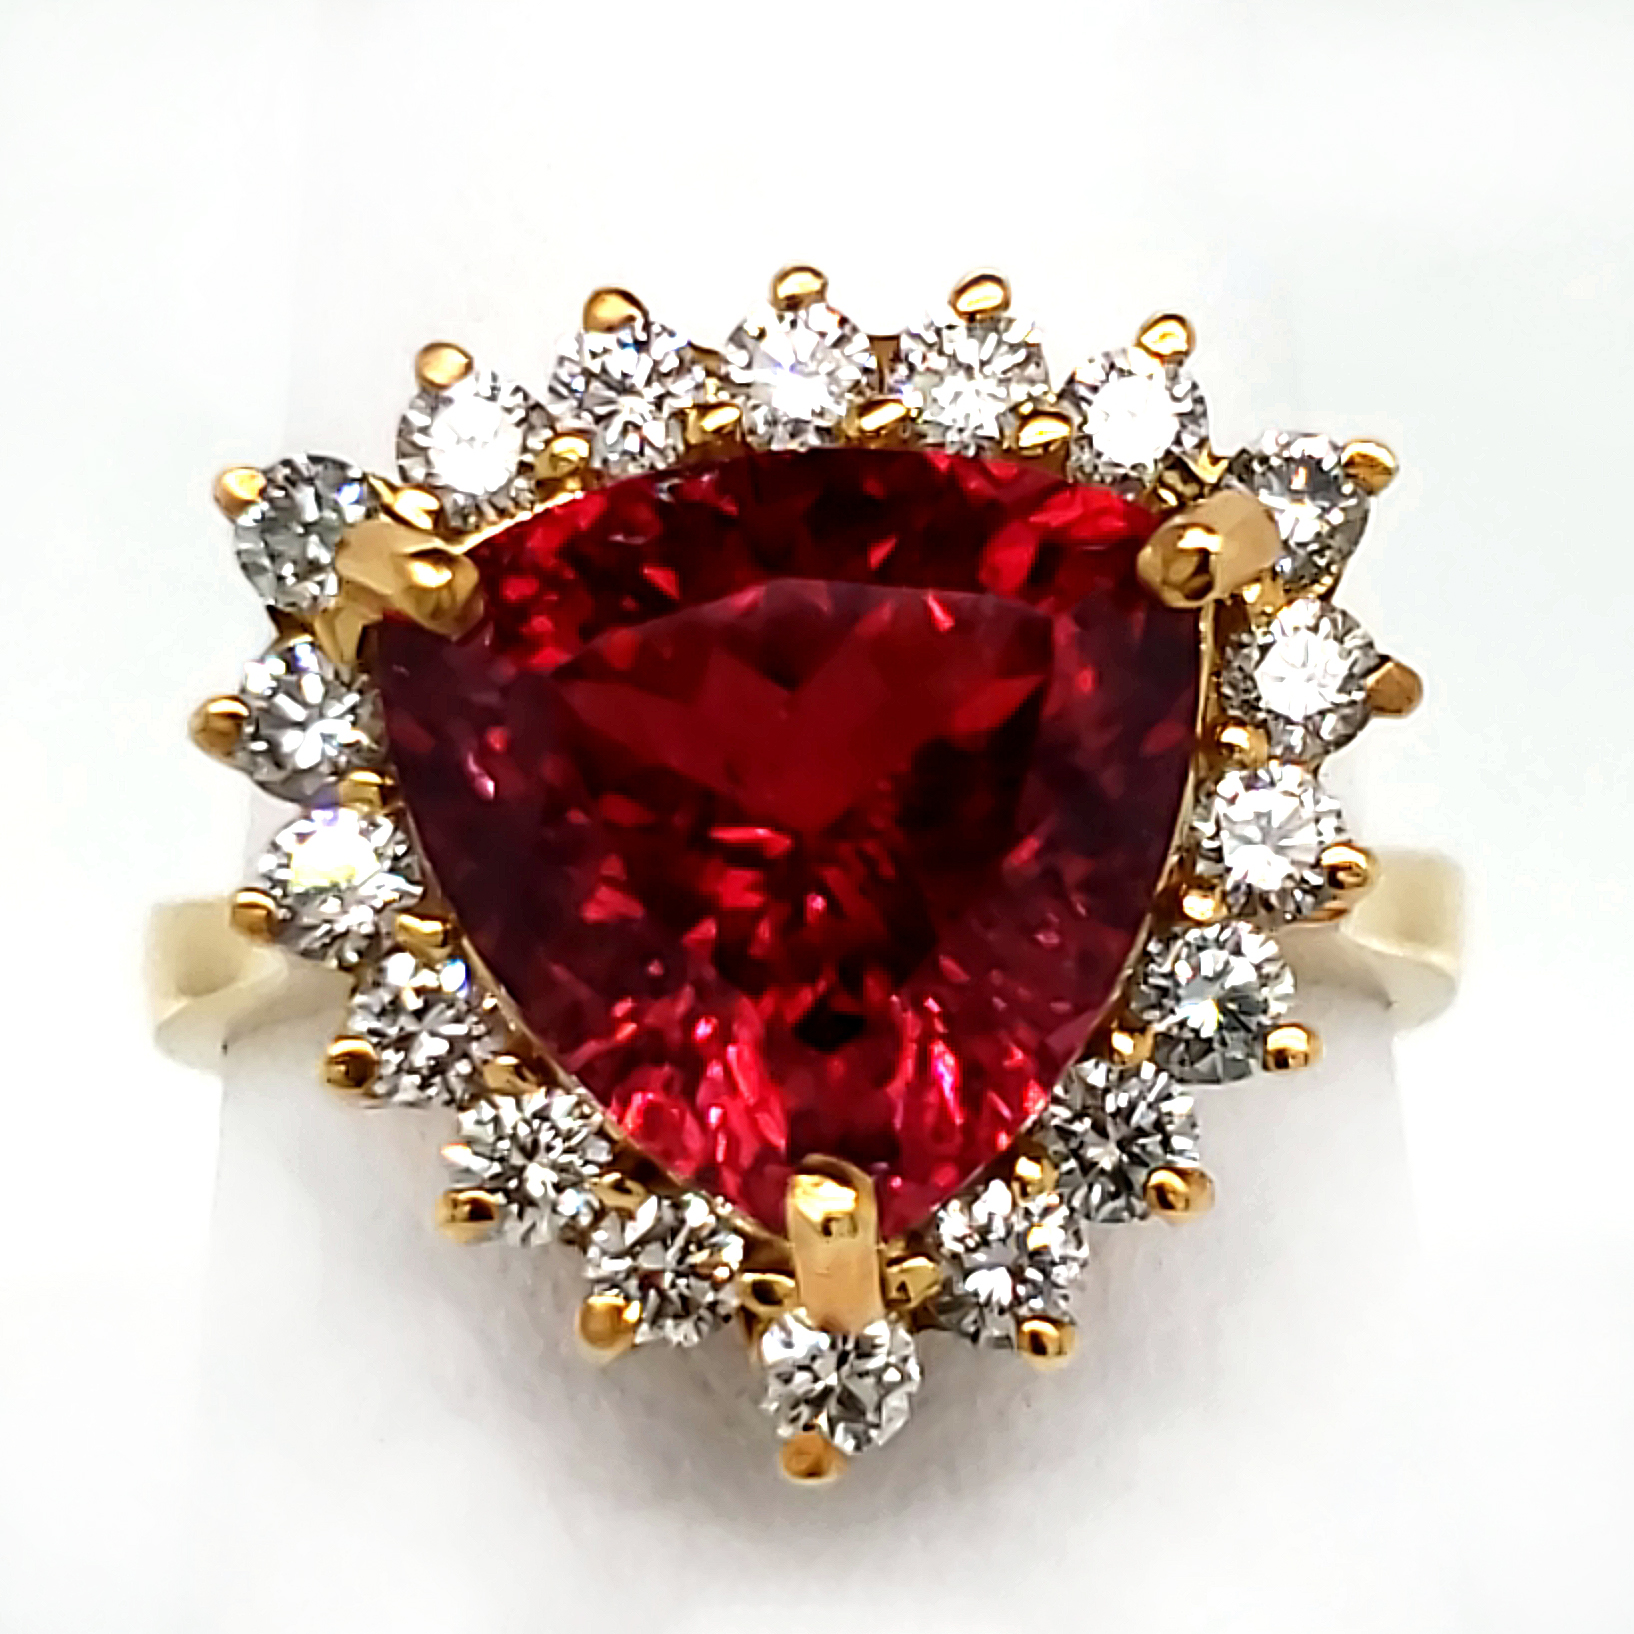 4.4 carat Rubellite Tourmaline and Diamond Ring